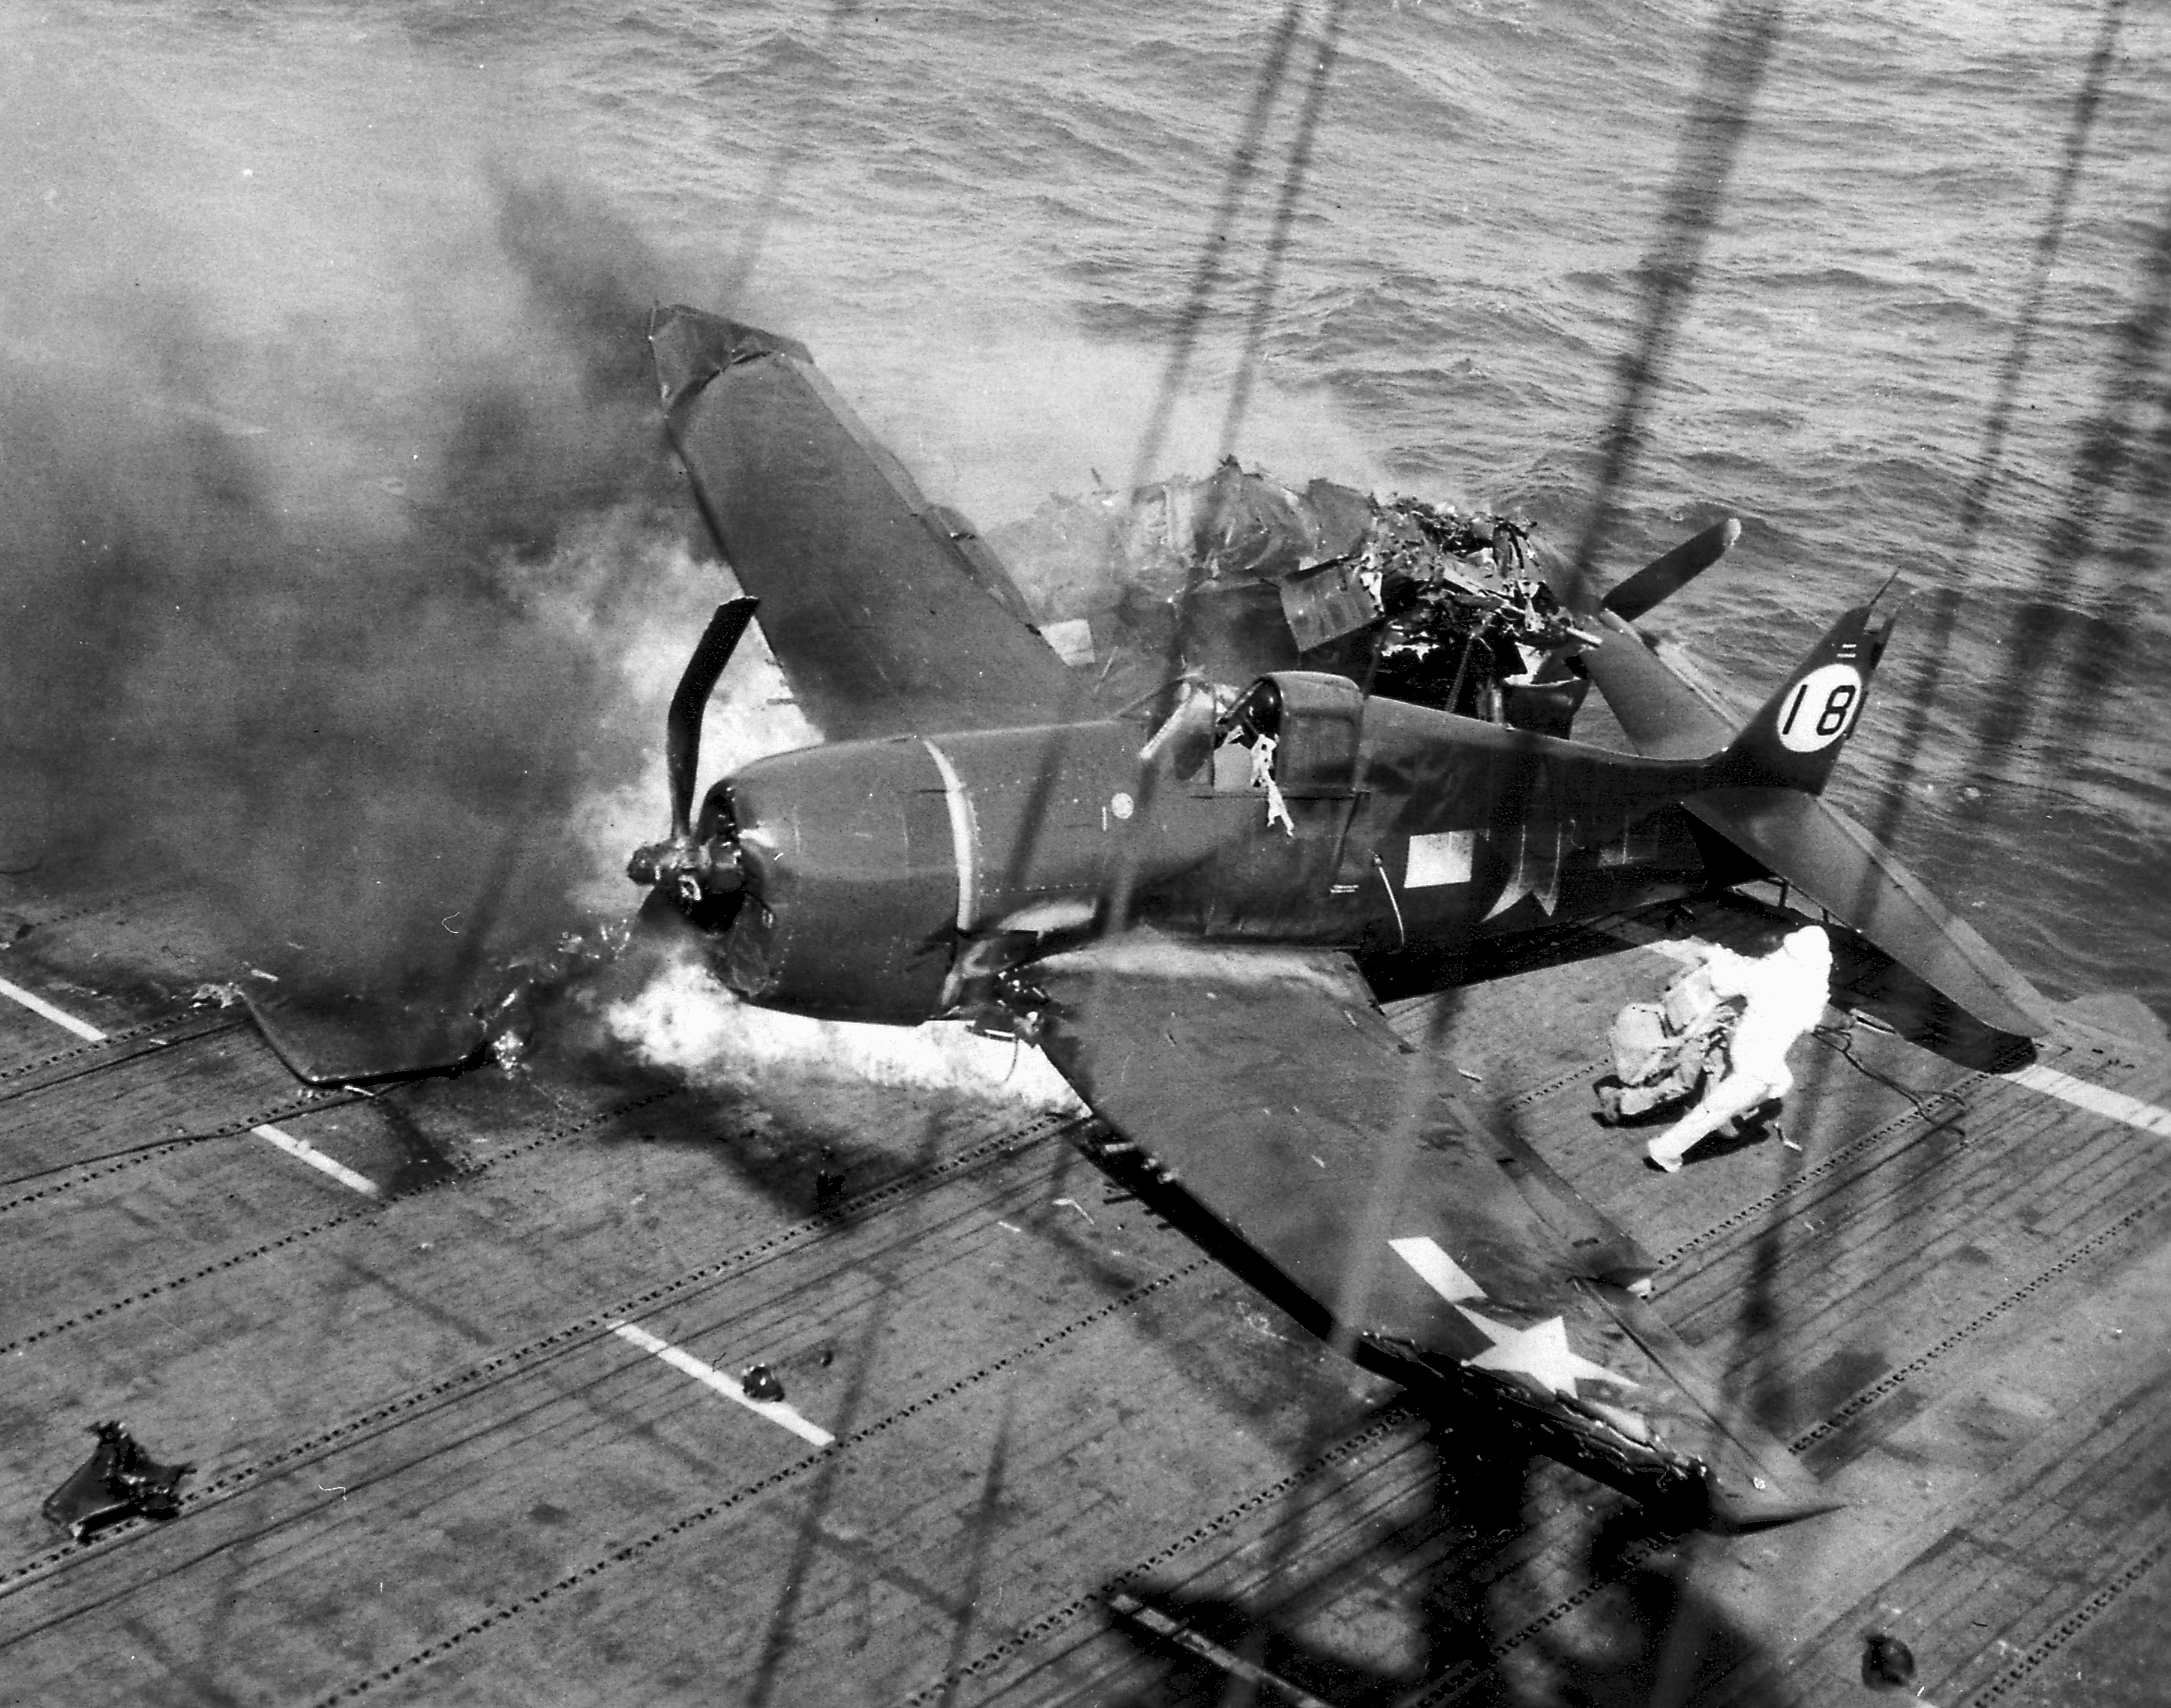 Grumman F6F 5 Hellcat VF 21 White 18 onboard collision CVL 24 USS Belleau Wood 1944 01